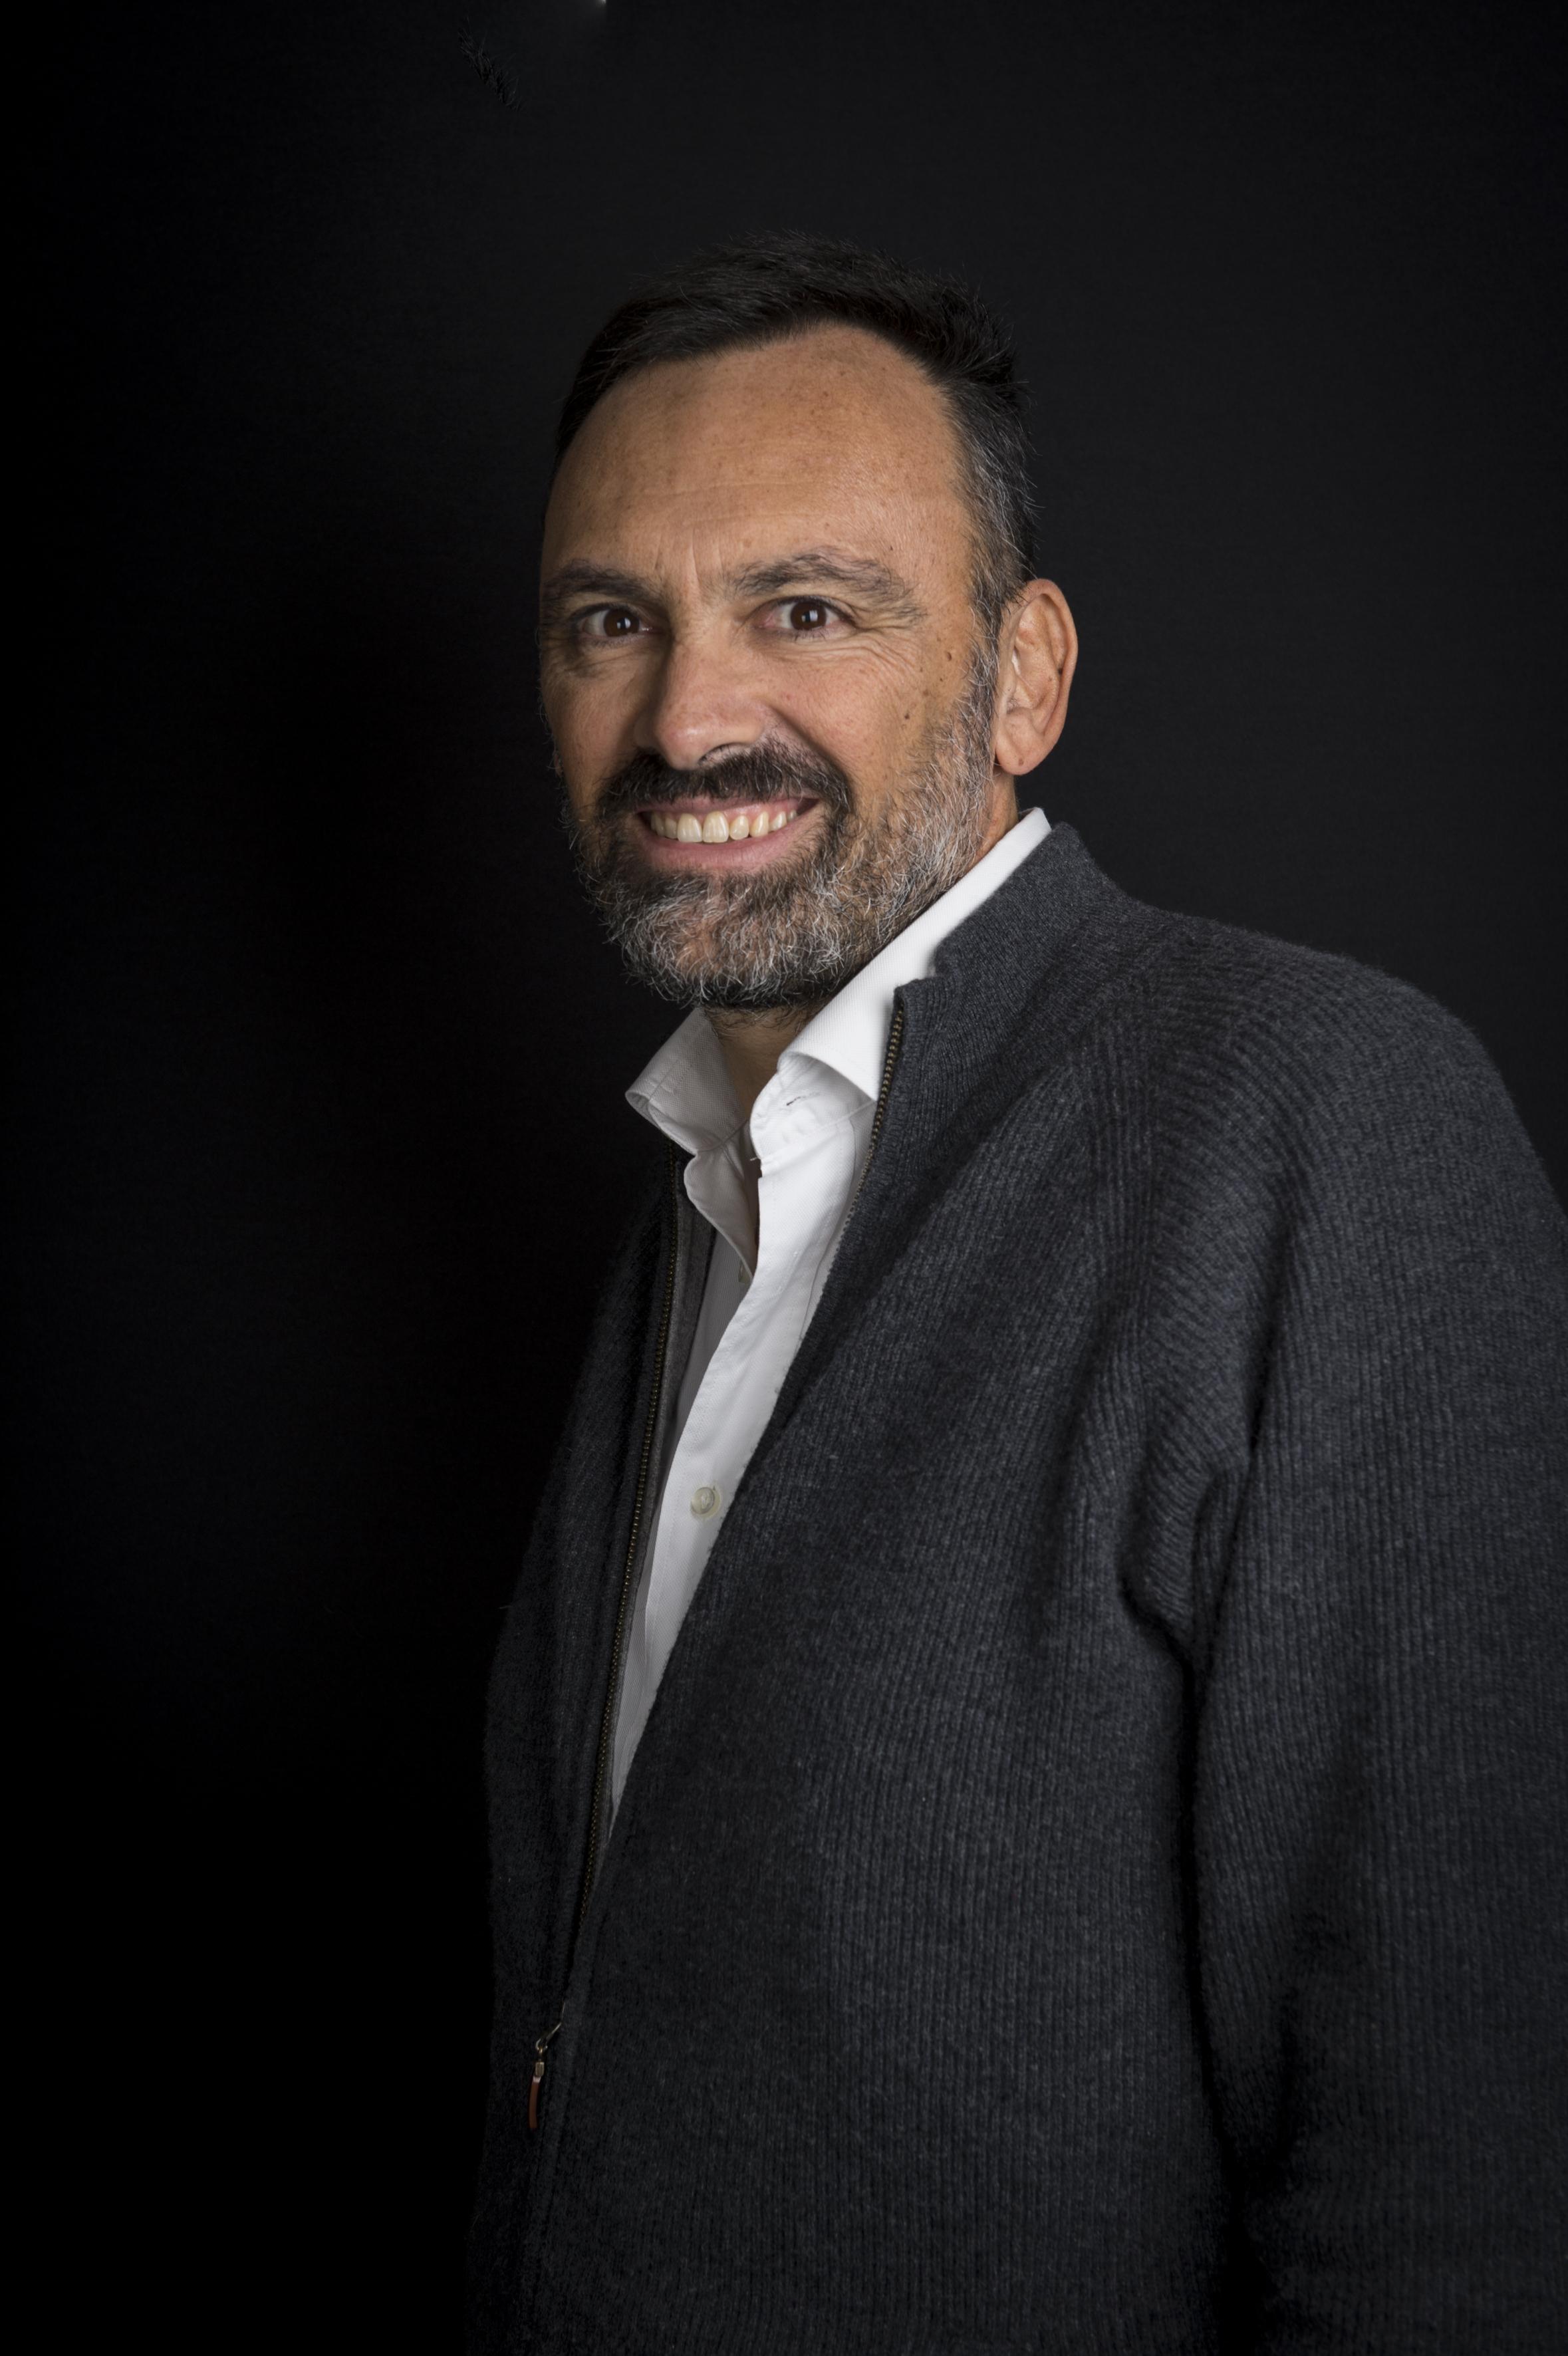 Alberto Nava